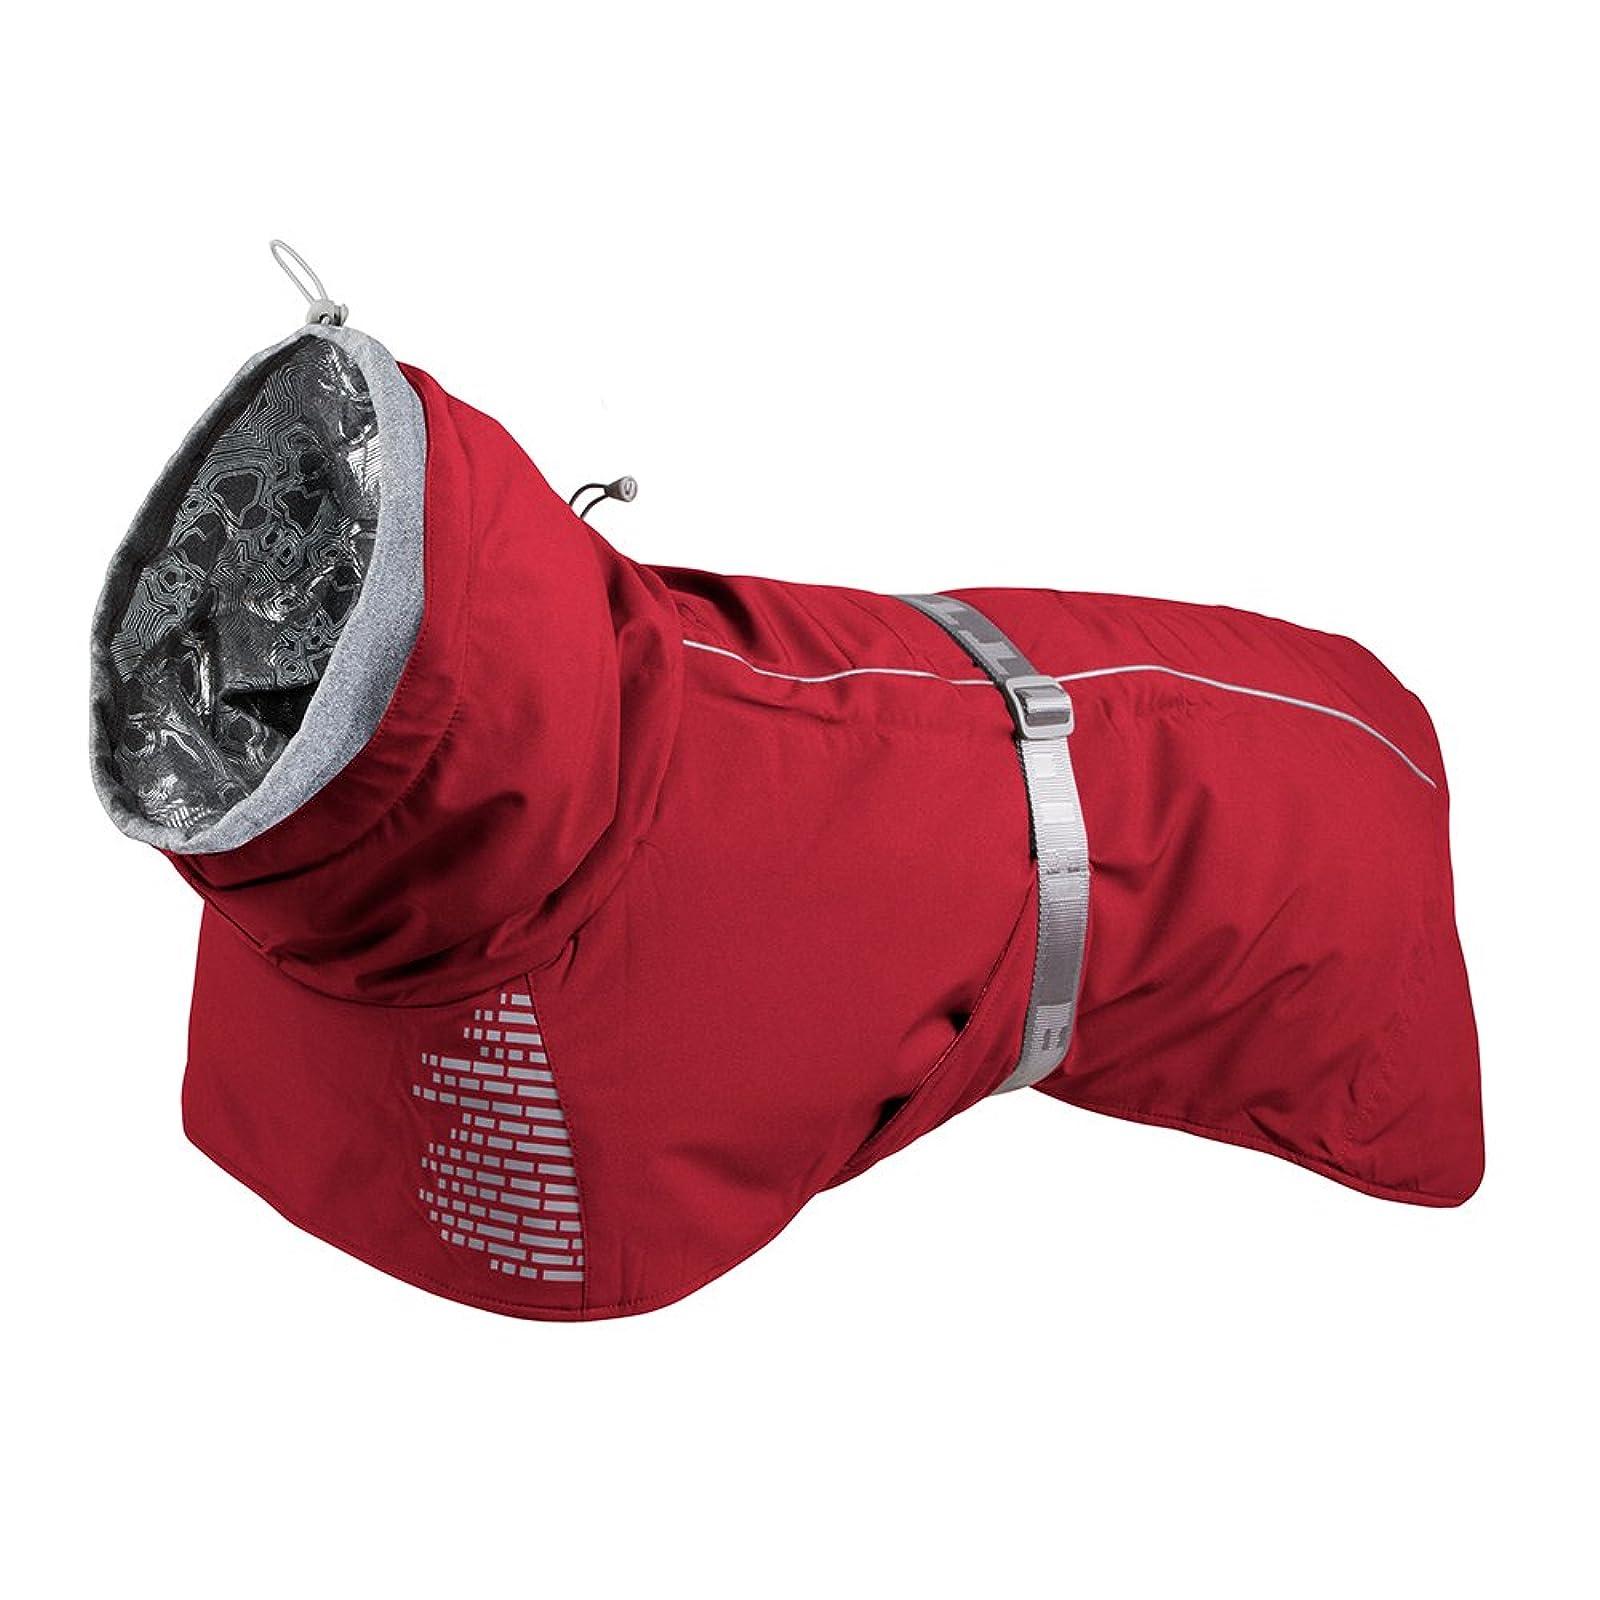 Hurtta Extreme Warmer Dog Winter Jacket Lingon HU932968 - 1